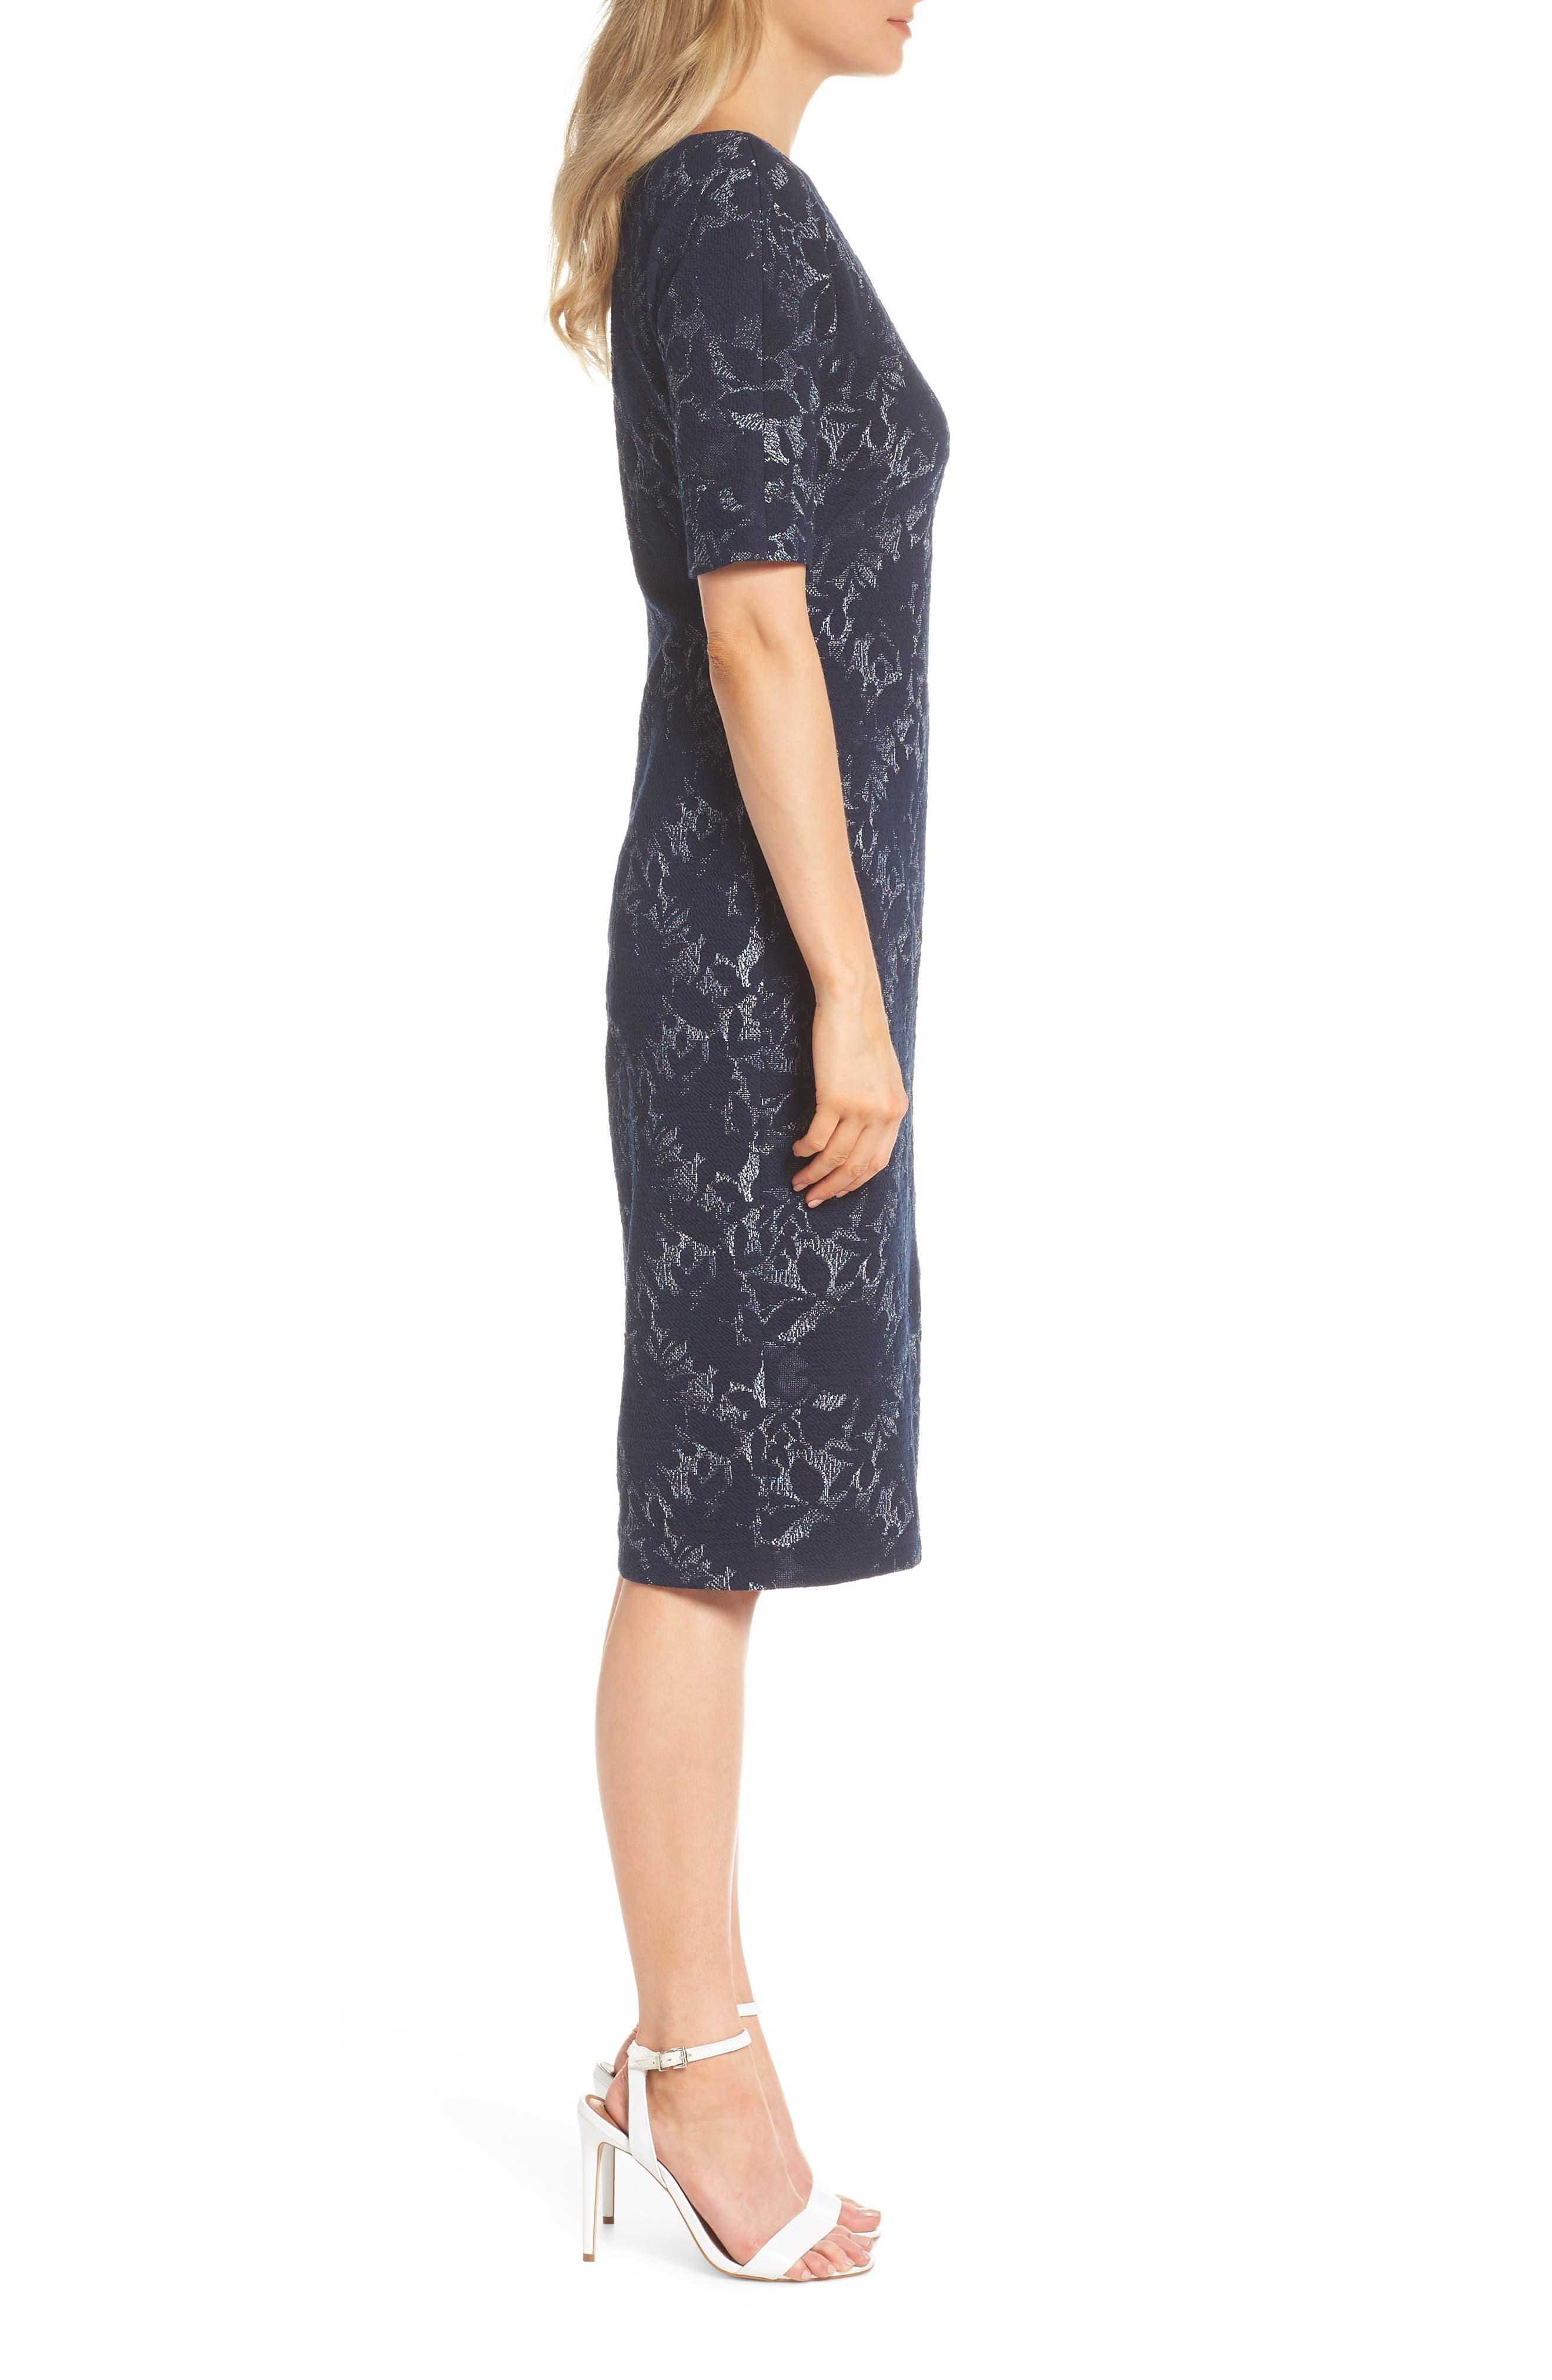 MAGGY LONDON,                             Jacquard Pencil Dress,                             Alternate thumbnail 3, color,                             462